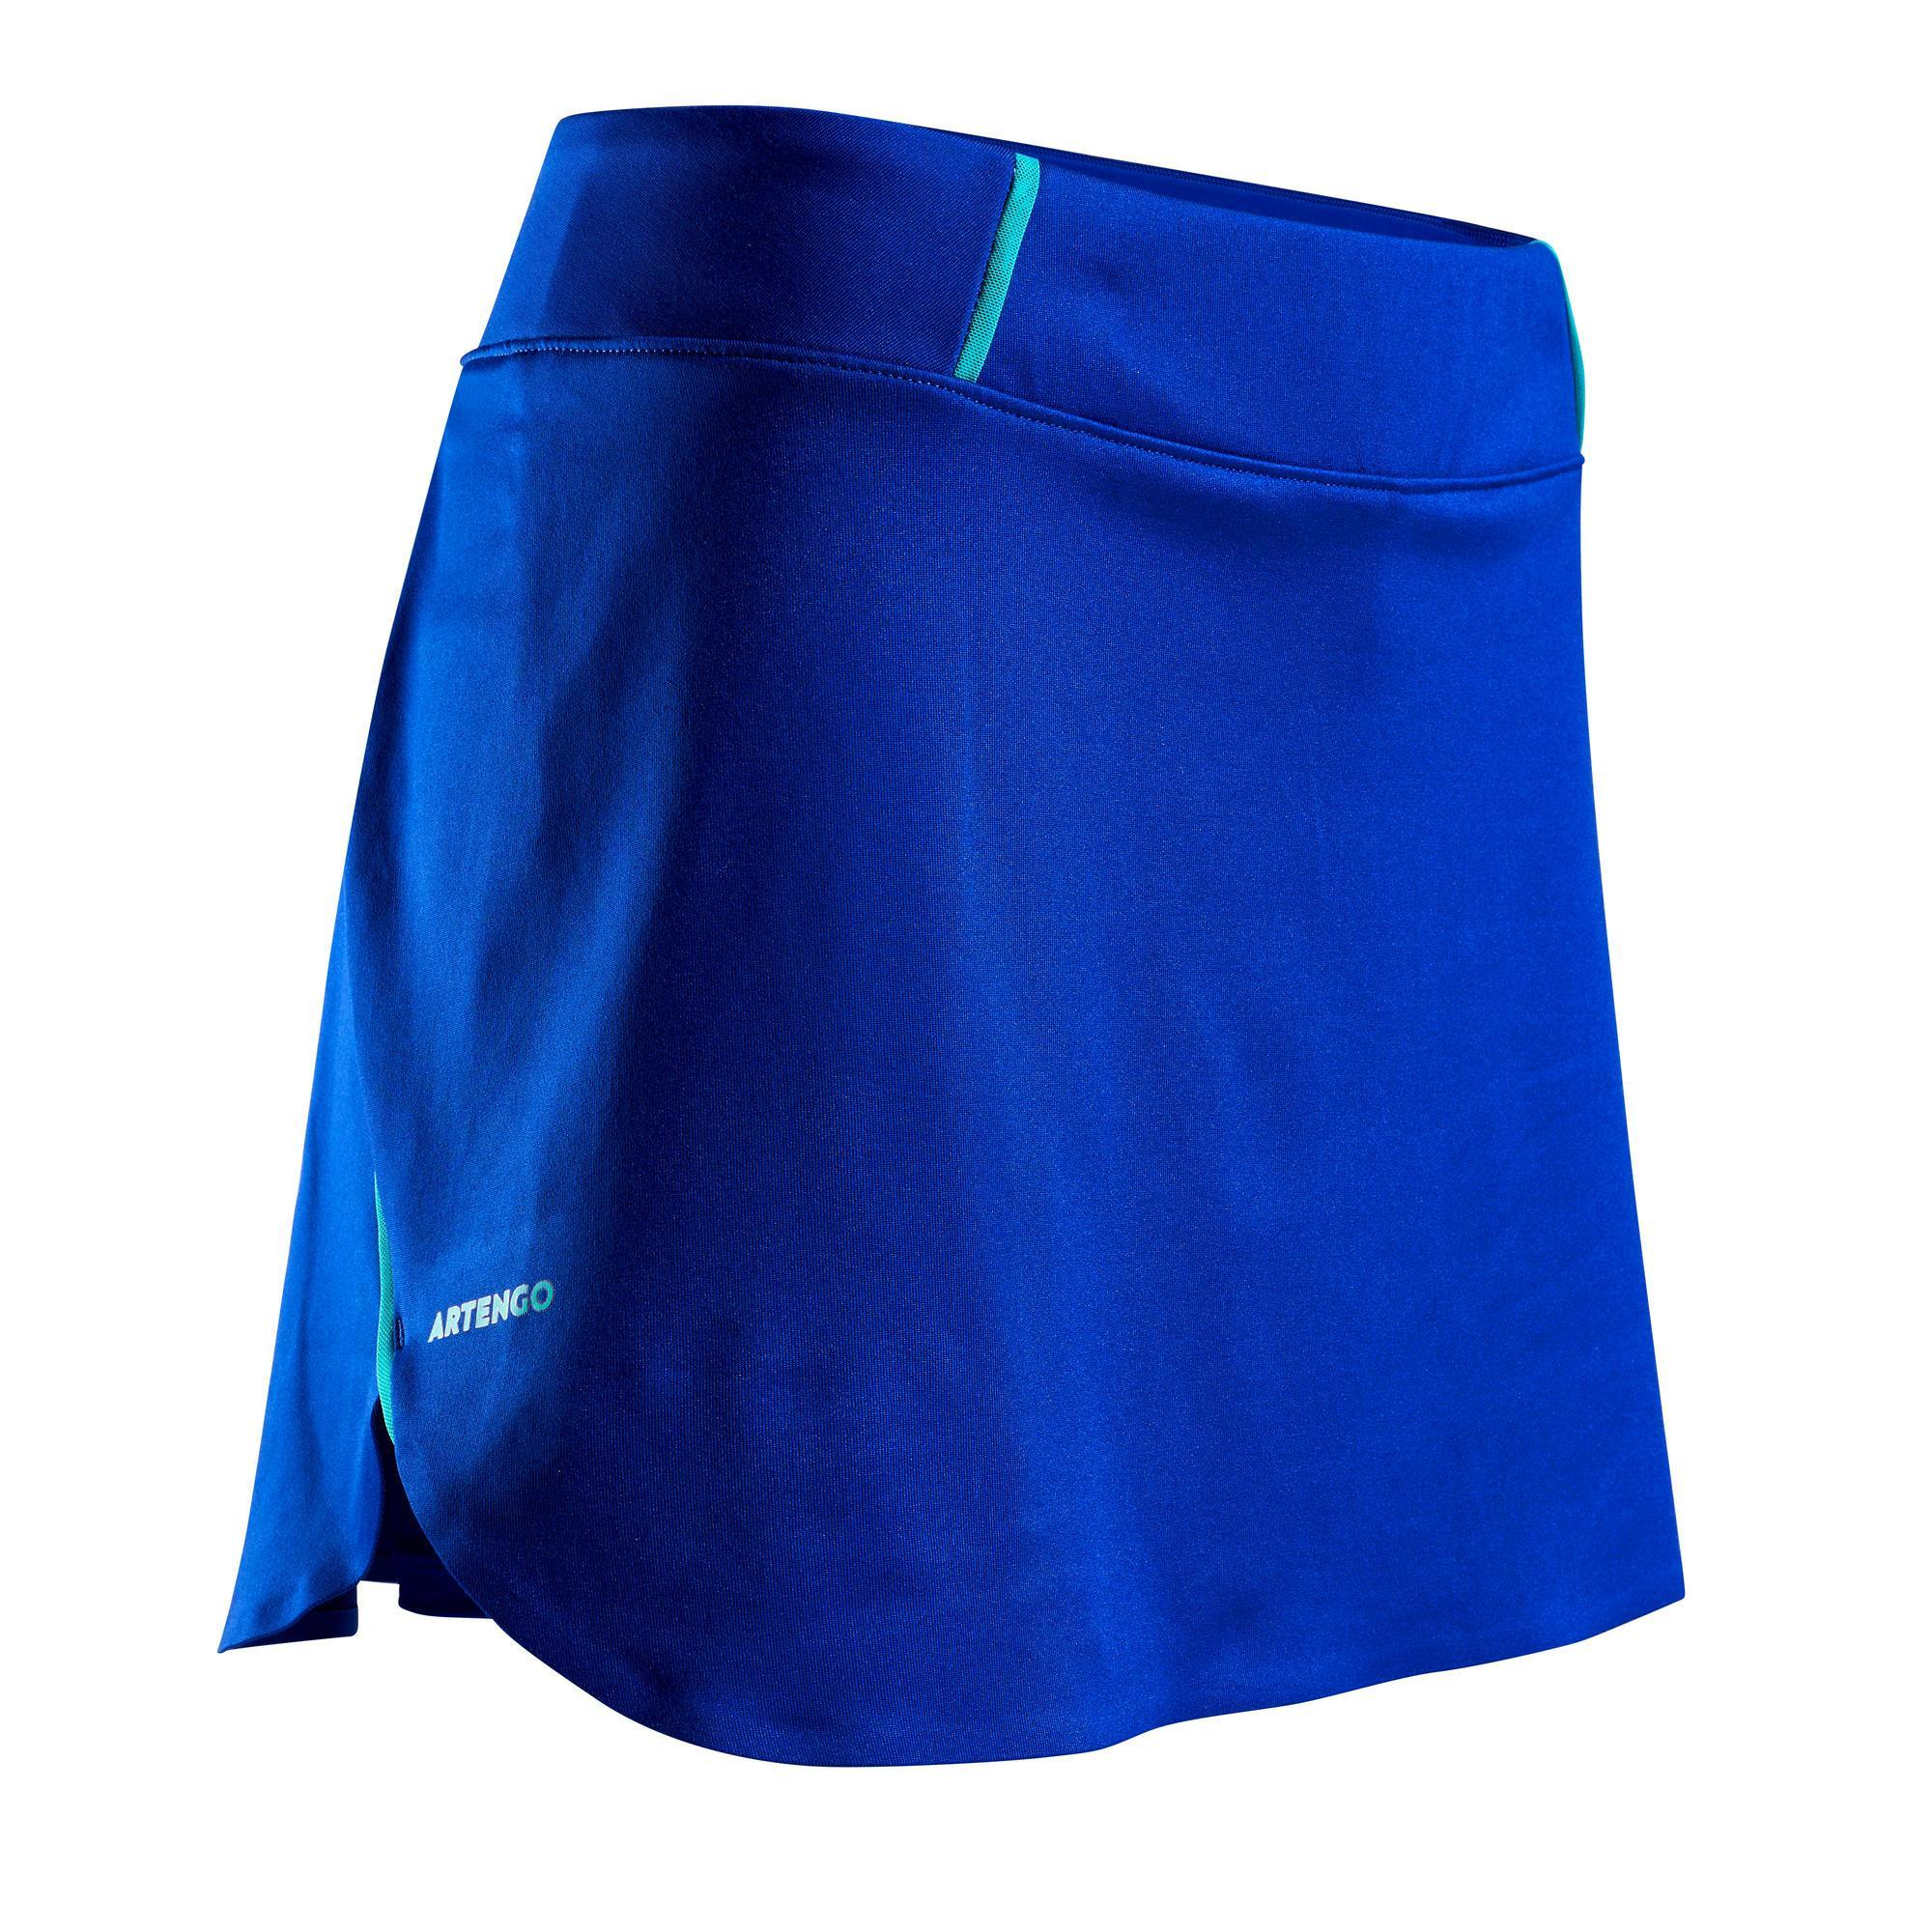 Tennisrock SK Light 990 Damen blau | Sportbekleidung > Sportröcke | Blau - Grün - Türkis | Artengo